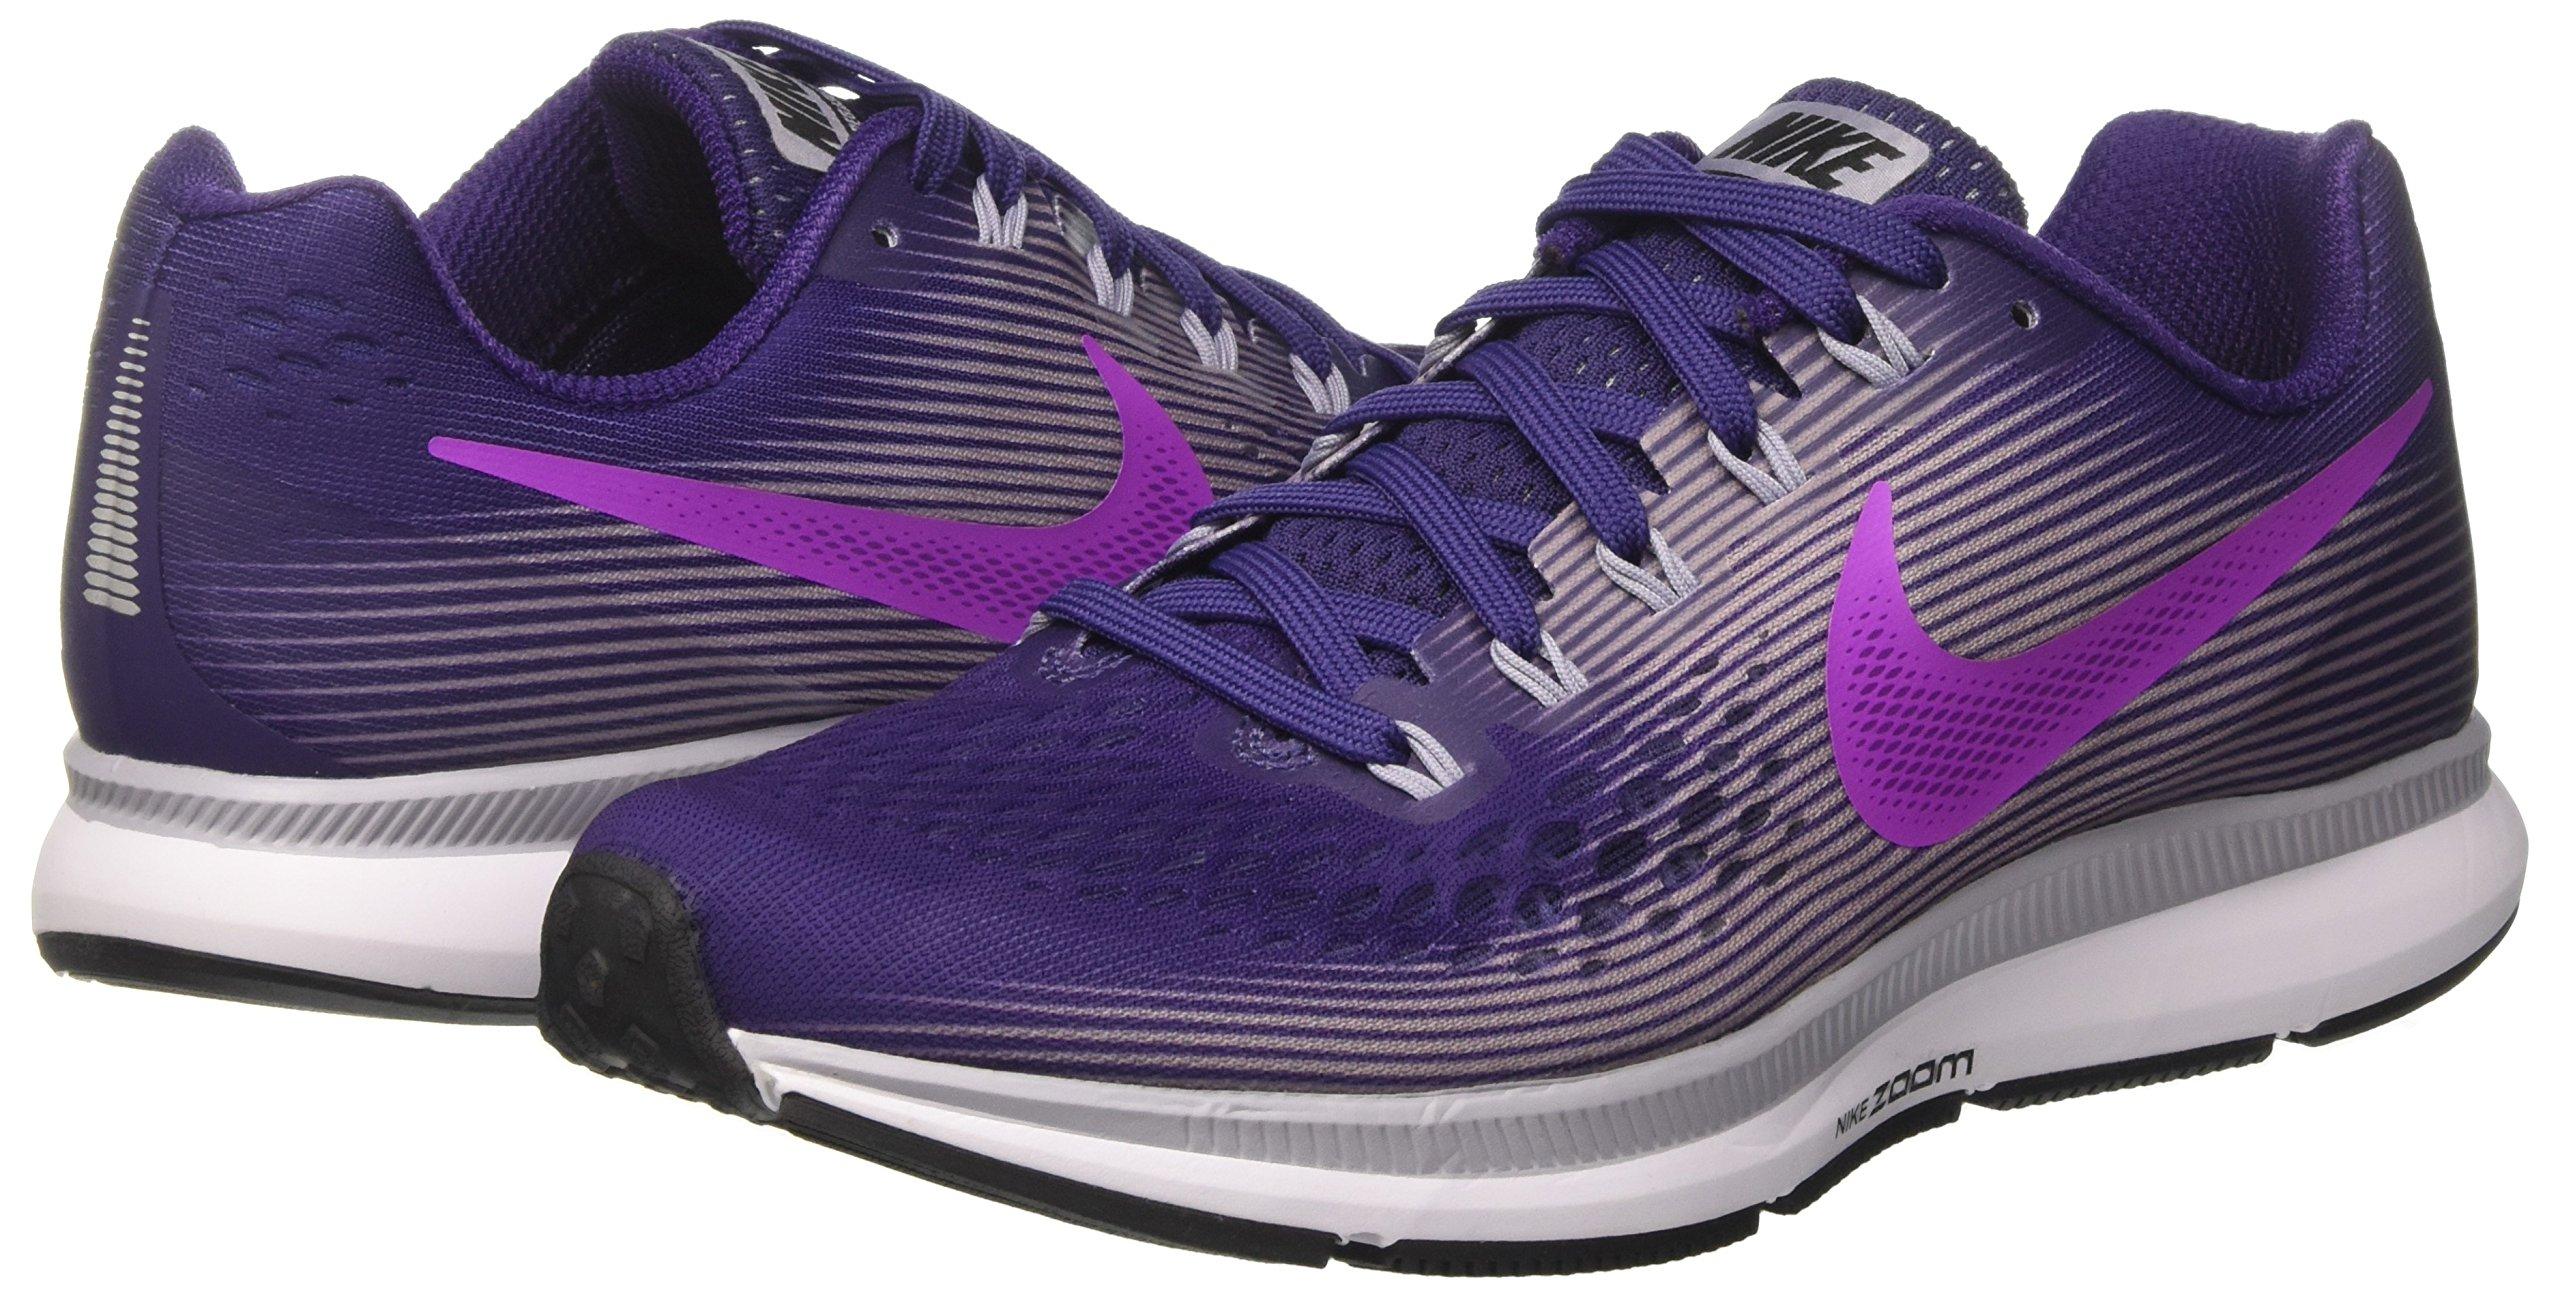 Nike Women's Air Zoom Pegasus 34 Running Shoes-Ink/Hyper Violet-6 by Nike (Image #5)